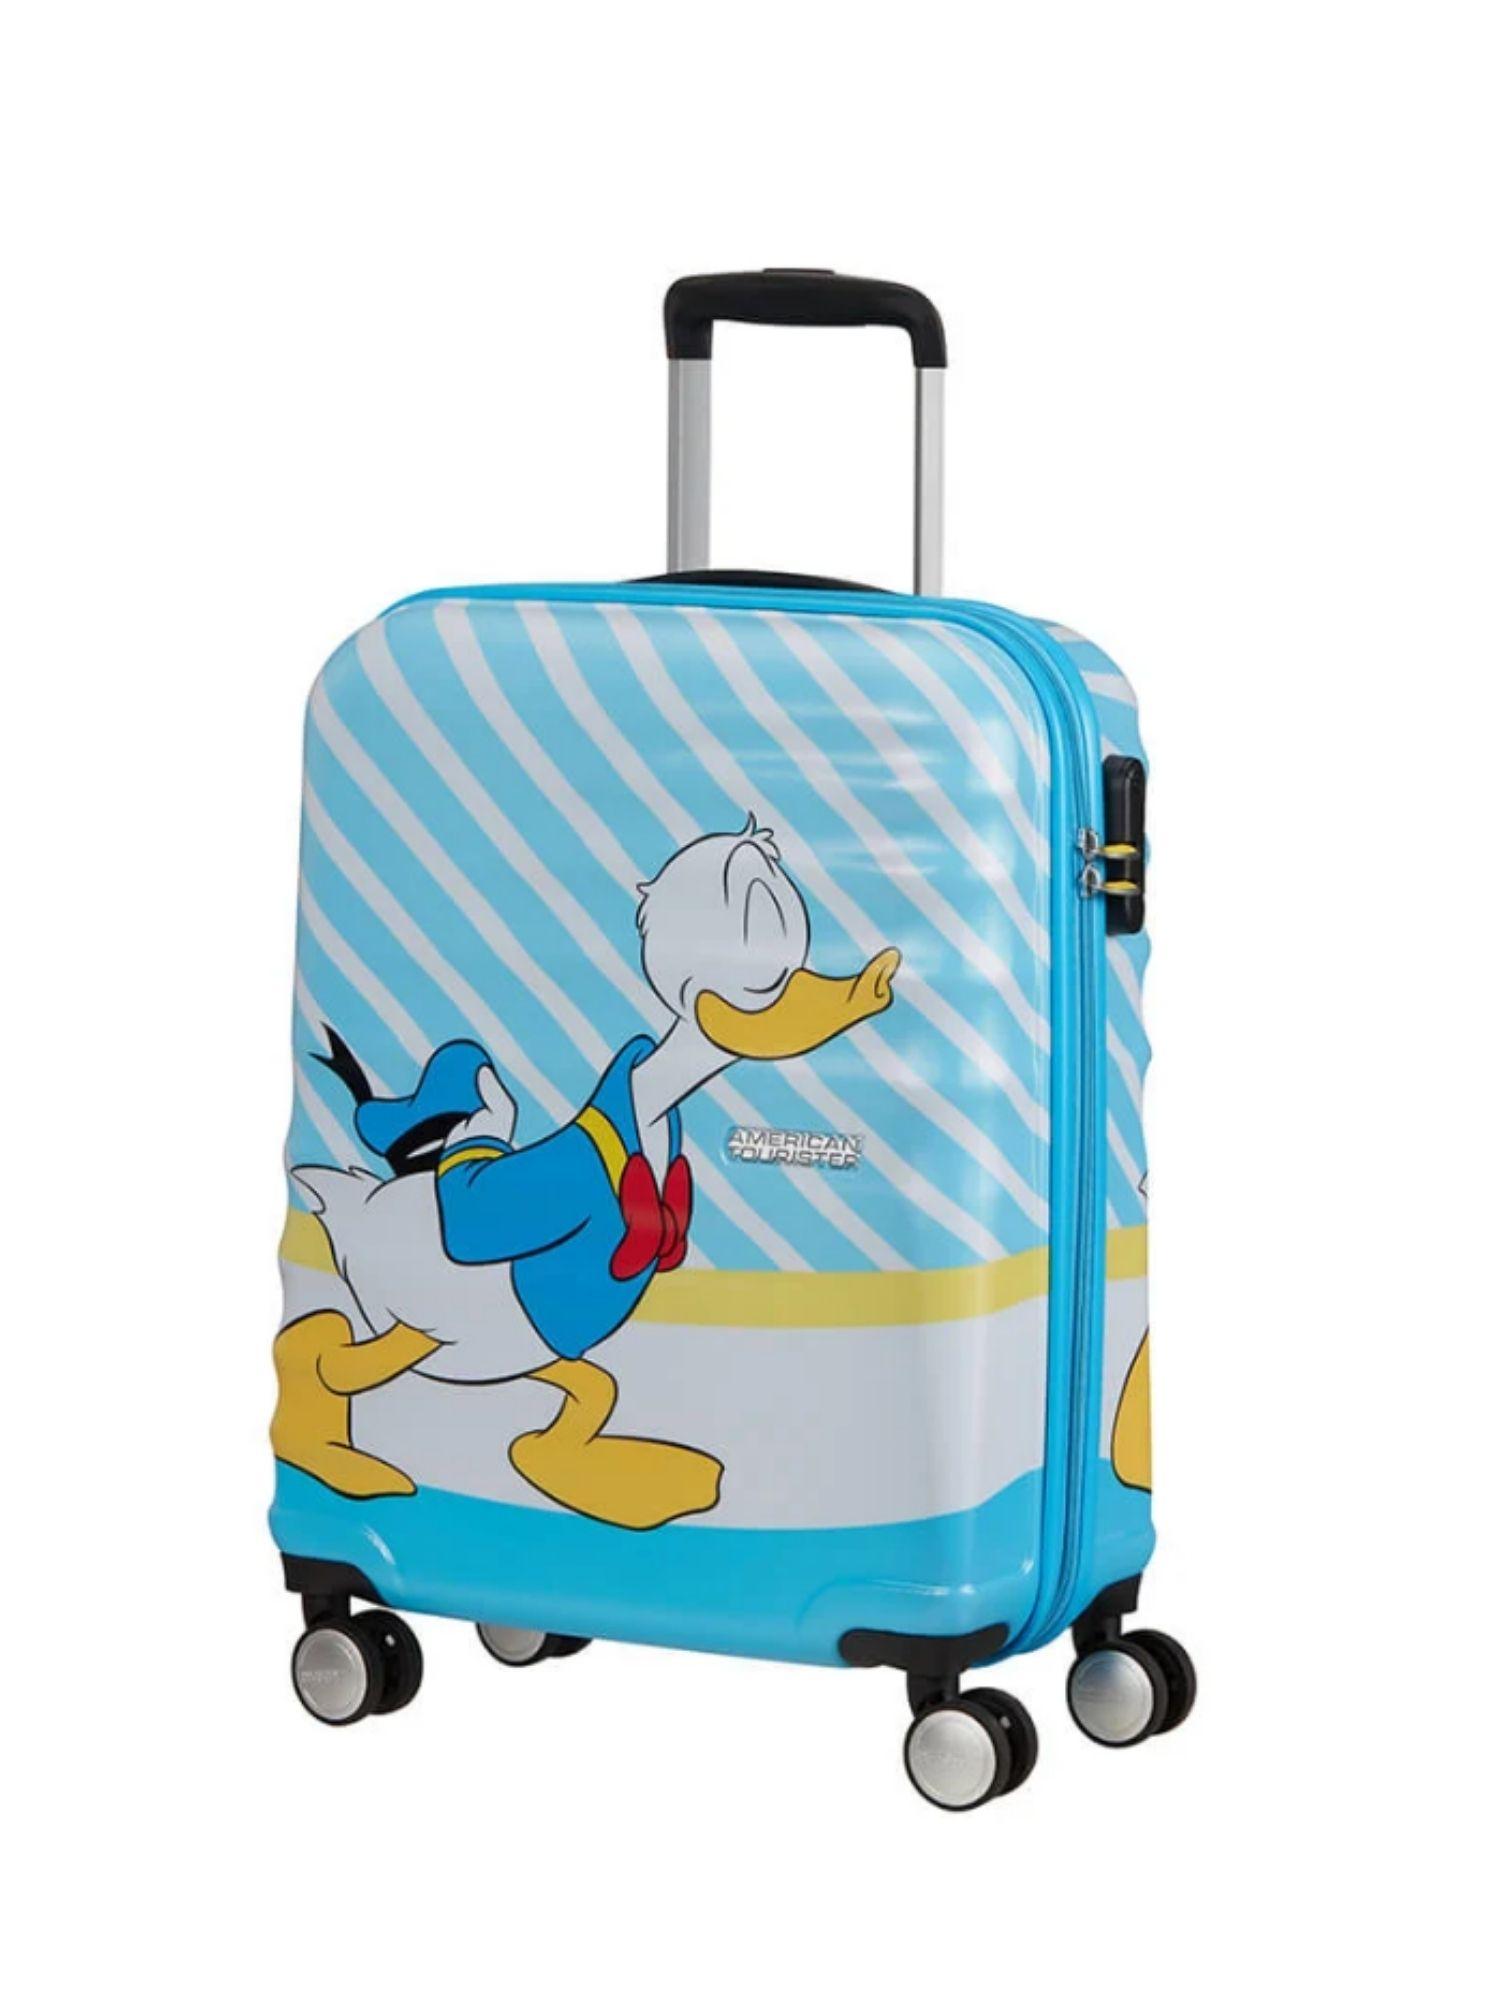 Trolley American Tourister 4 ruote 55 cm. Wavebreaker Disney Donald Blue Kiss